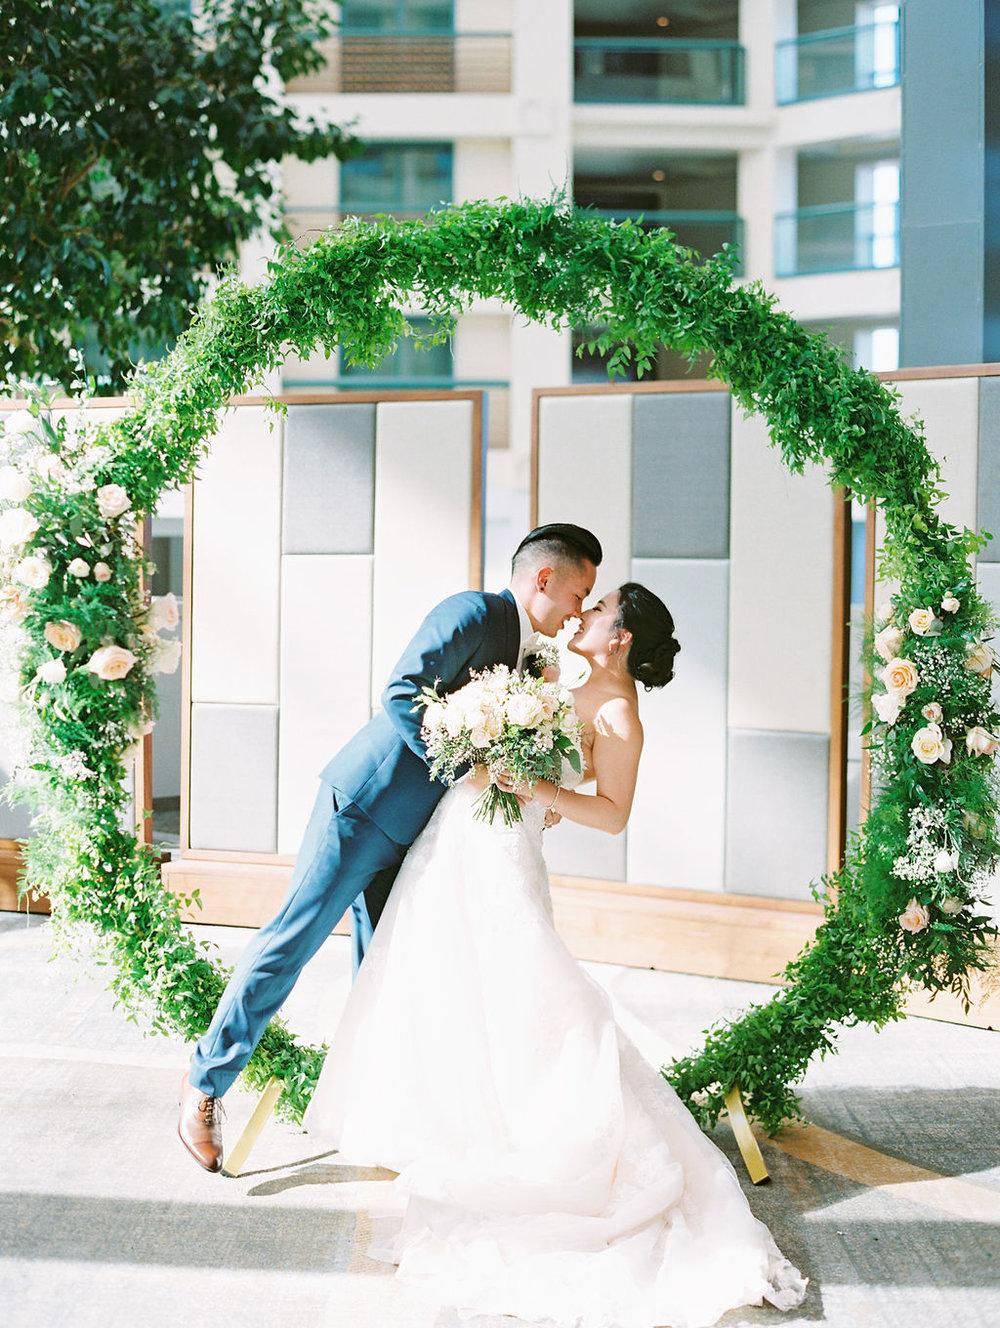 JennySoiPhotography-S&SSFAirportWeddingBrideandGroom-228.jpgSan Francisco Fairmont Hotel Wedding Fine Art Film Wedding Photographer